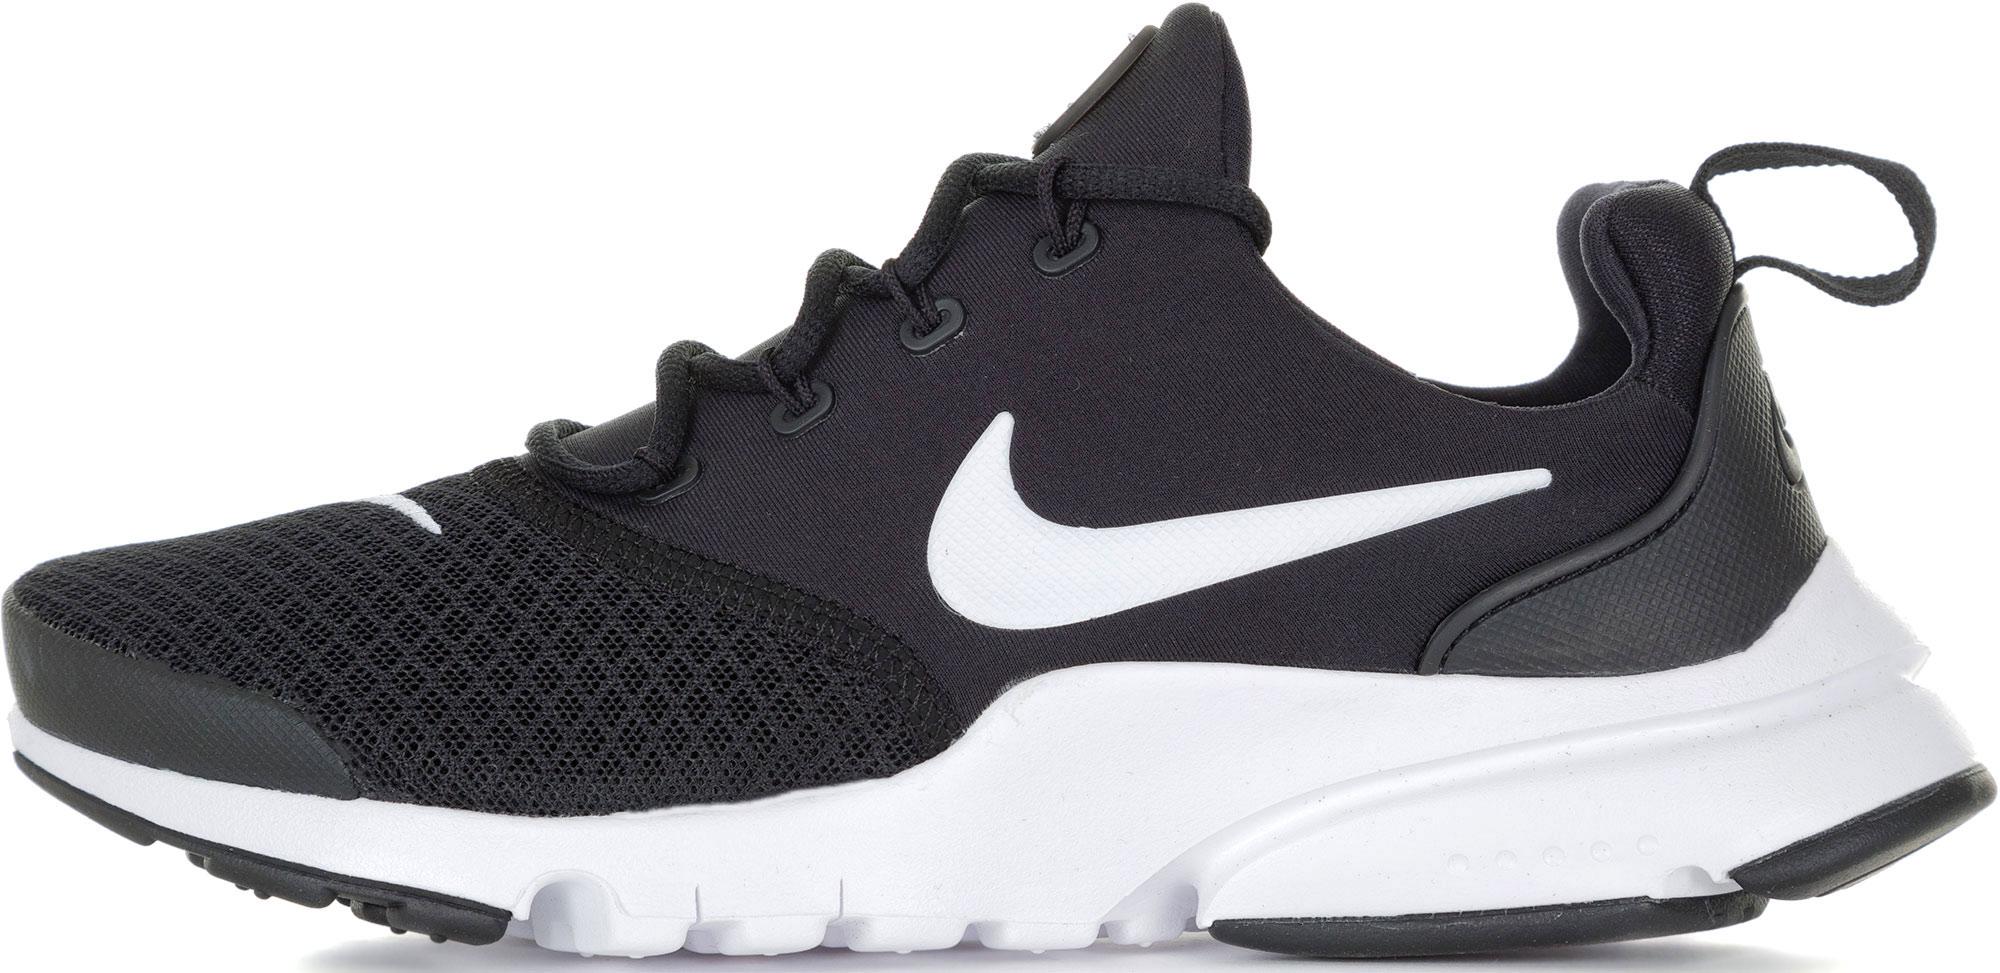 Nike Кроссовки для мальчиков Nike Presto Fly, размер 37,5 цена